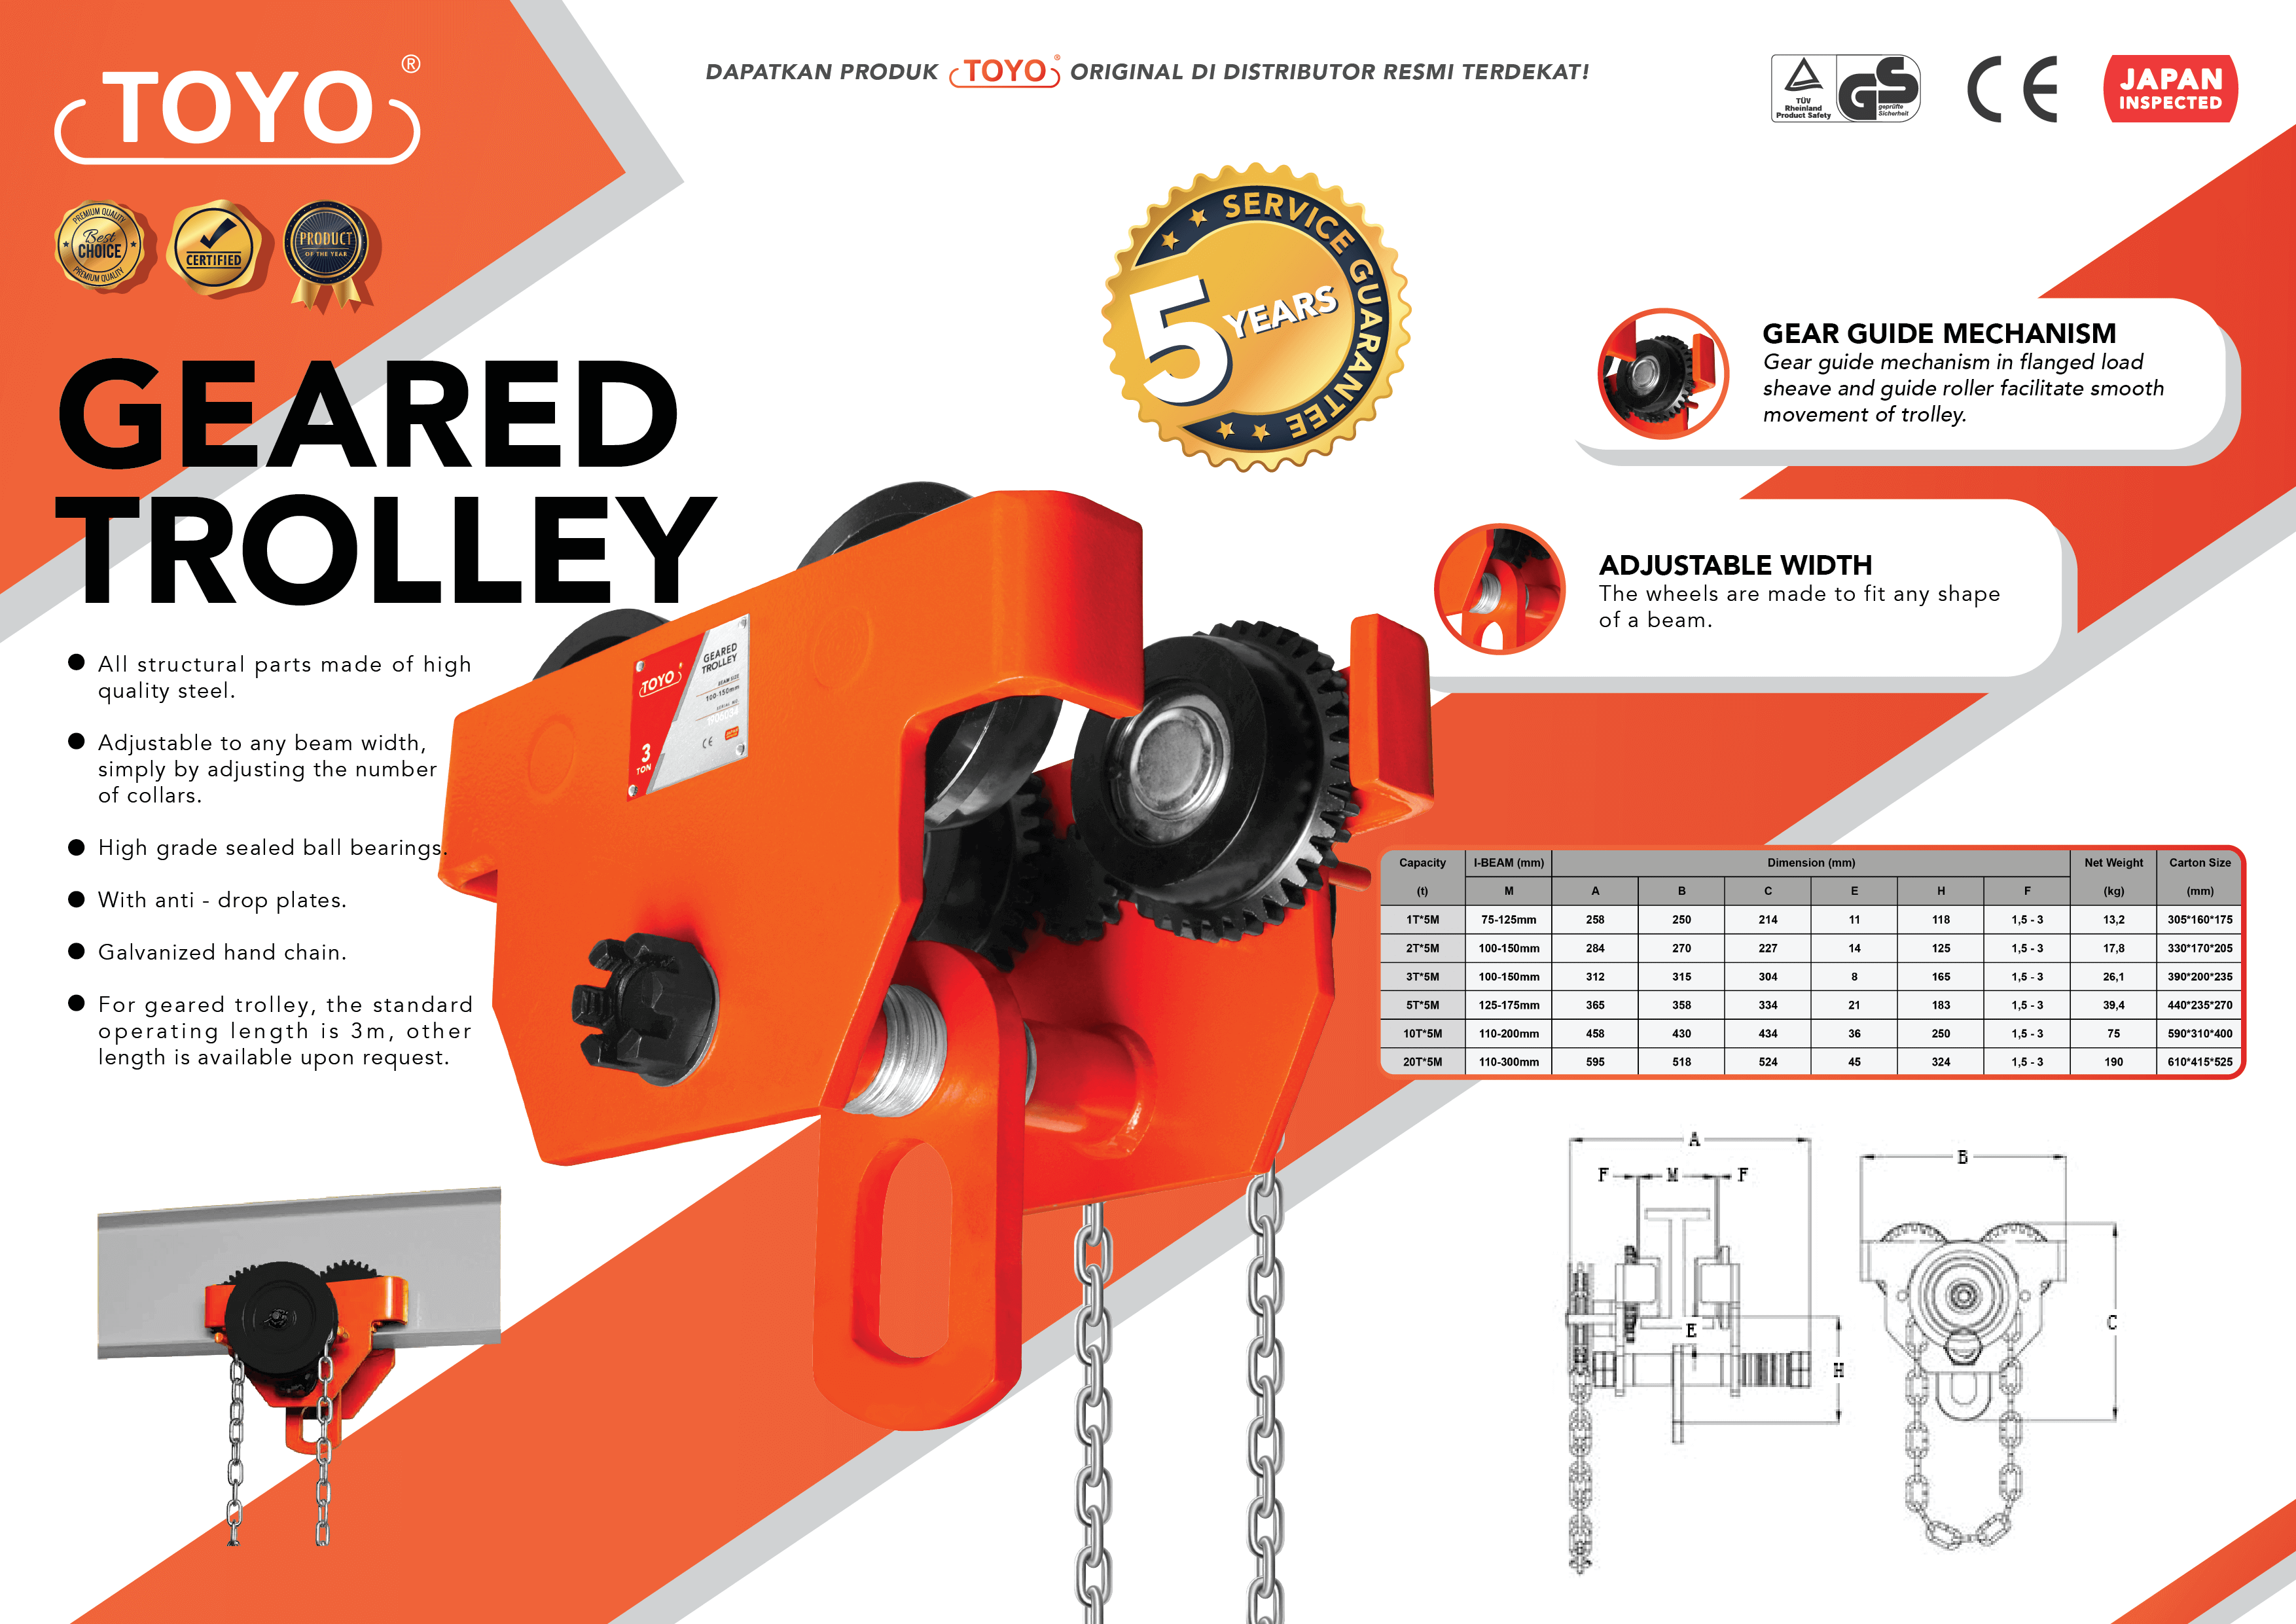 Spesifikasi Detail Geared Trolley Toyo Original